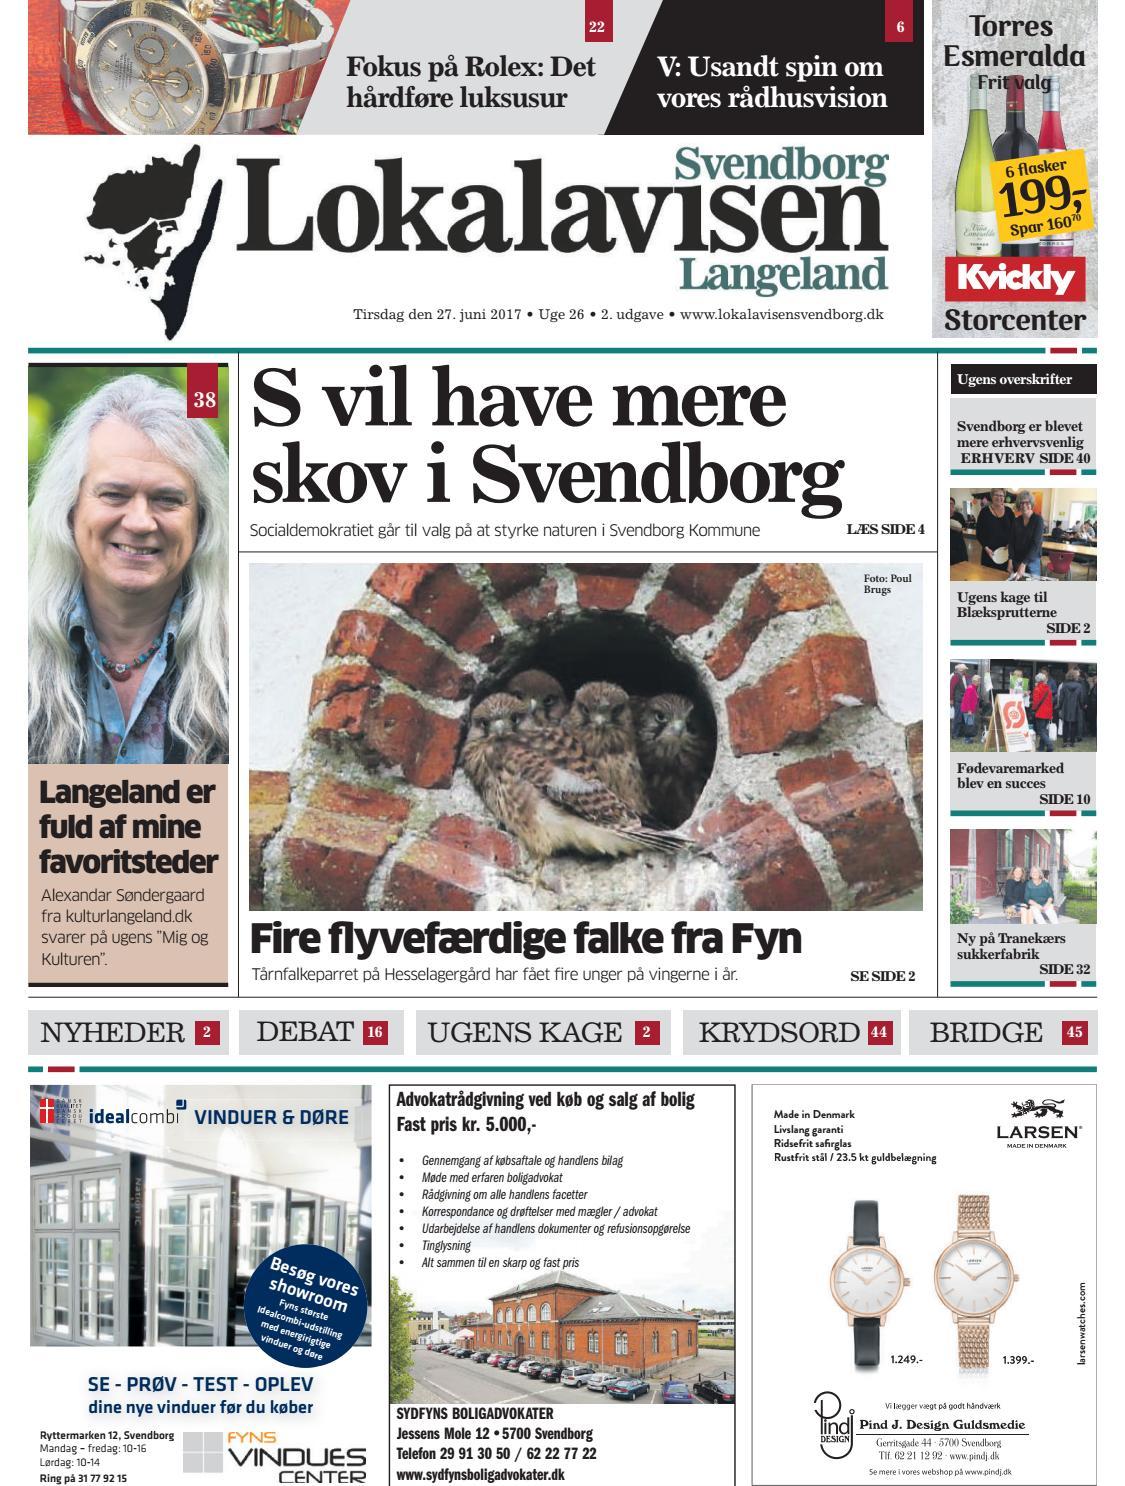 fefd42775794 Lokalavisen Svendborg uge 26 by Lokalavisen Svendborg - issuu